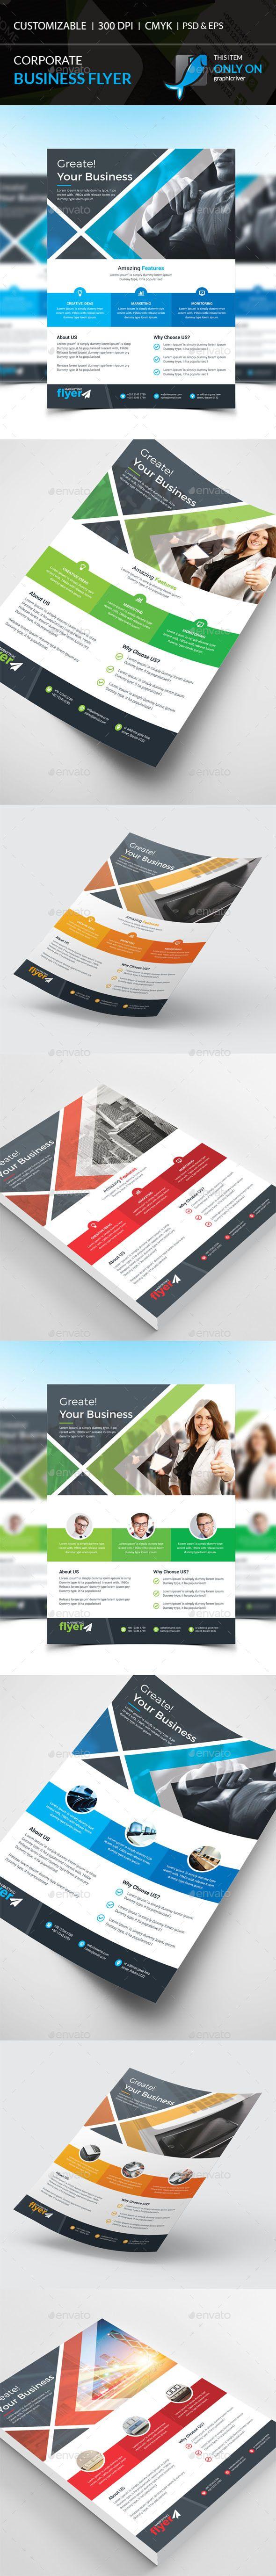 Corporate Flyer Template PSD, Vector EPS, AI #design Download: http://graphicriver.net/item/corporate-flyer/13841728?ref=ksioks